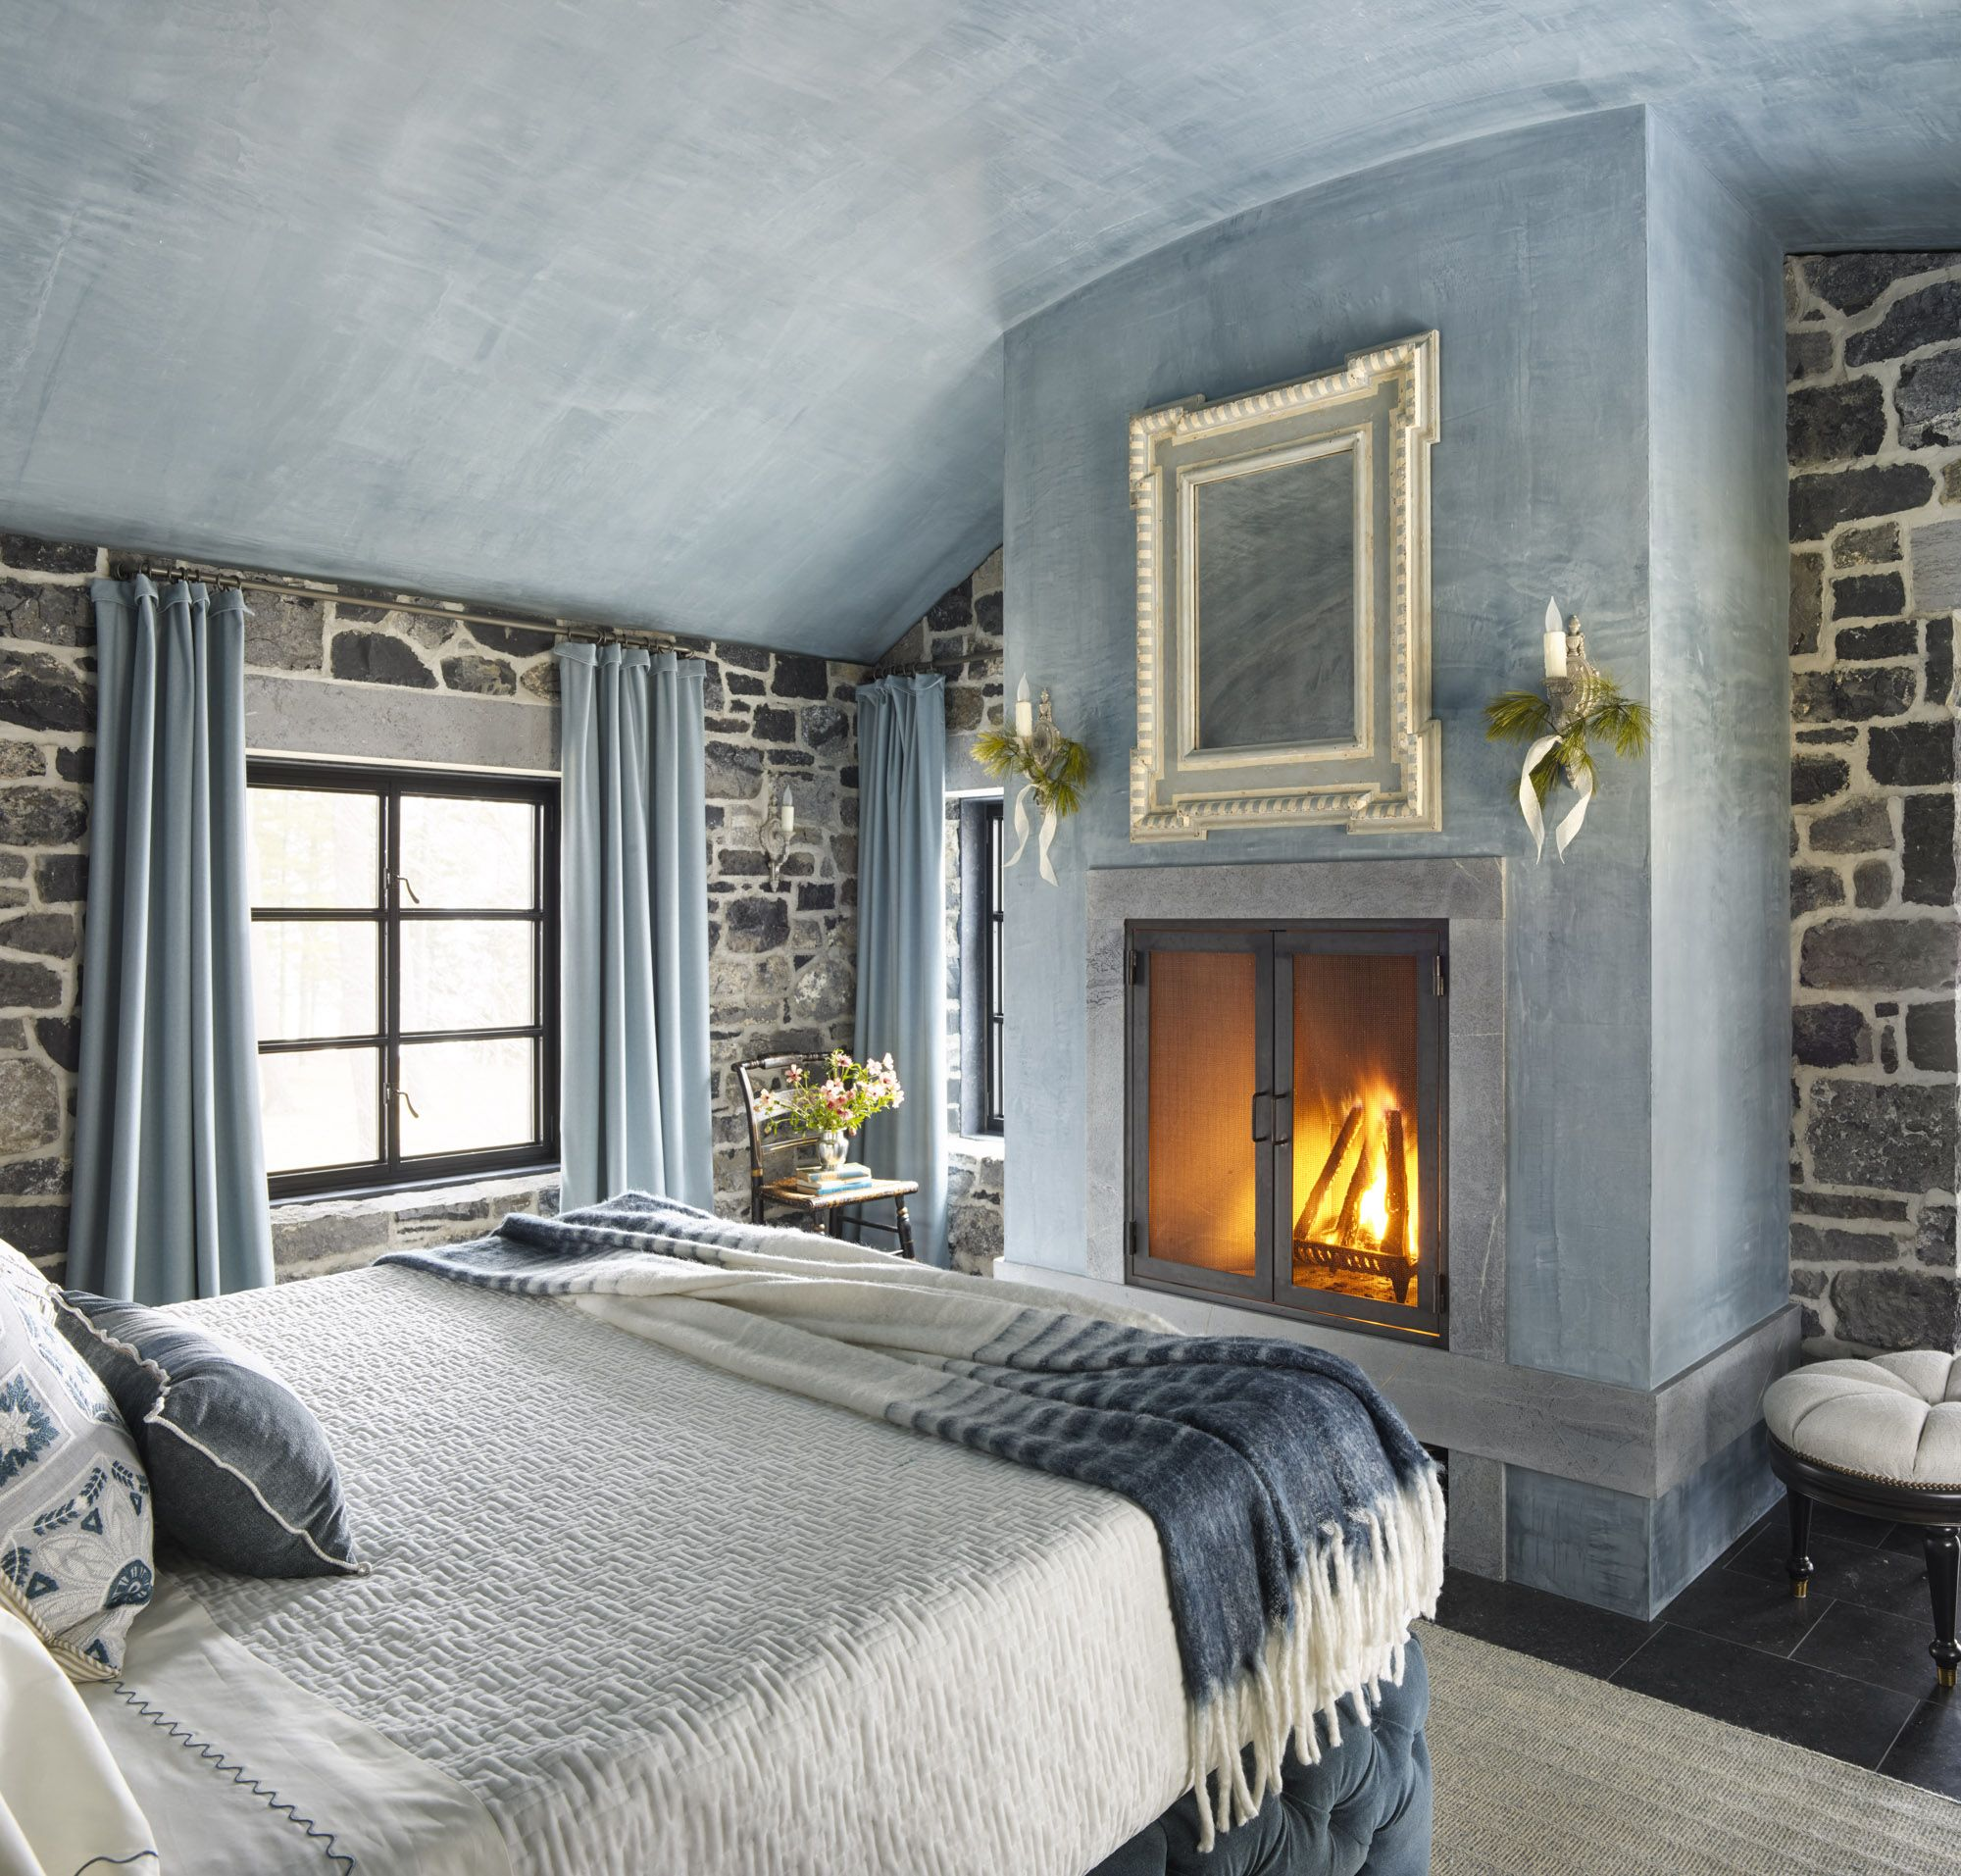 50 stylish bedroom design ideas modern bedrooms decorating tips rh housebeautiful com room interior design sdn bhd room interior design ideas